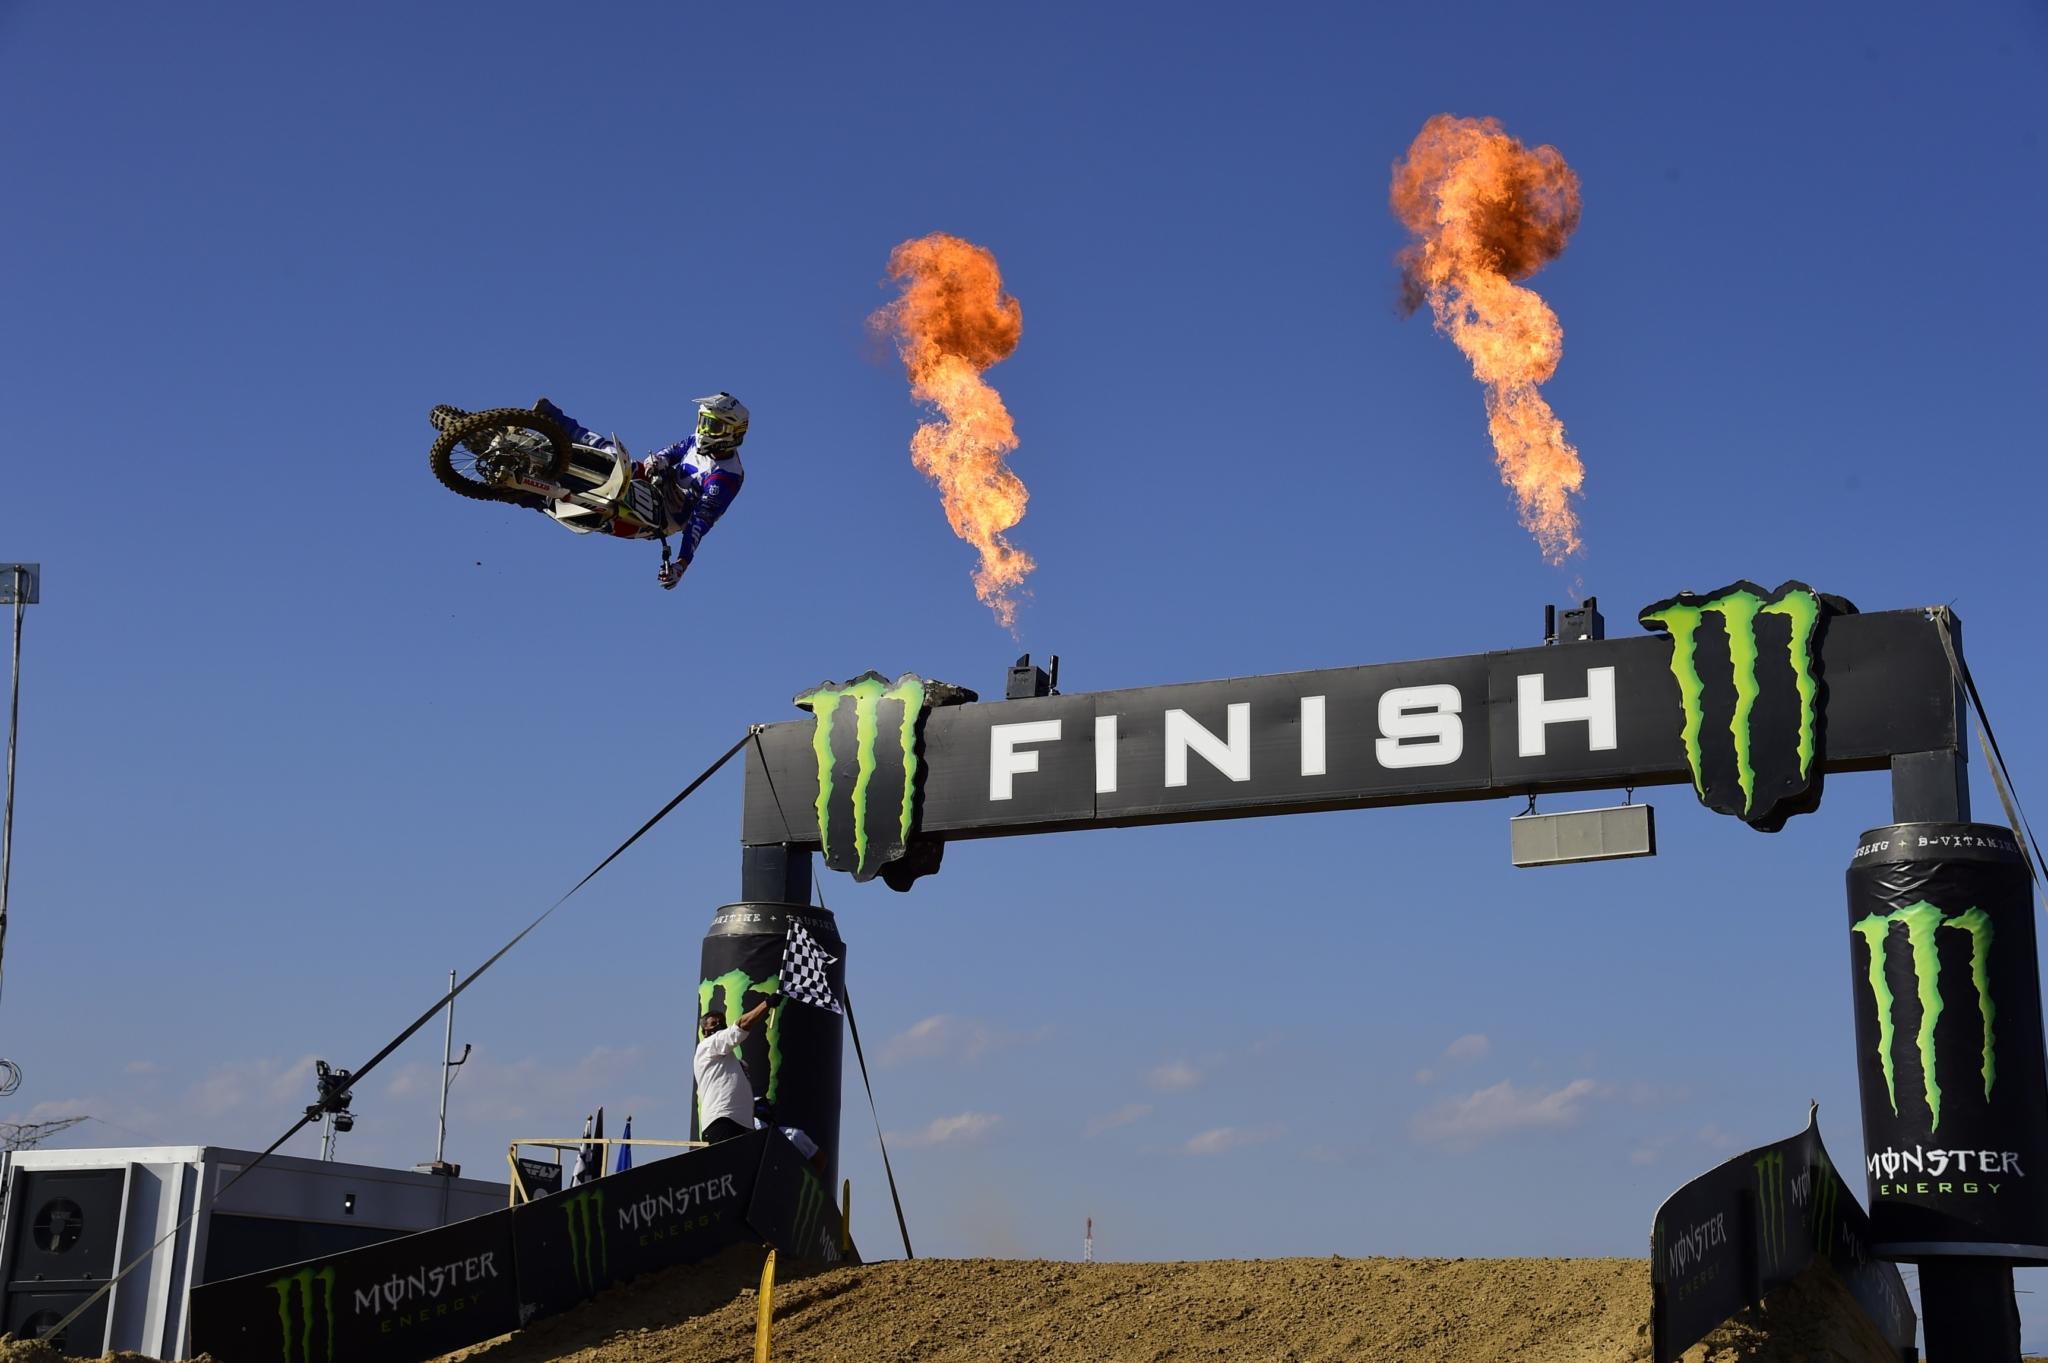 European motocross 'excellent showcase' for Maxxis MaxxCross range